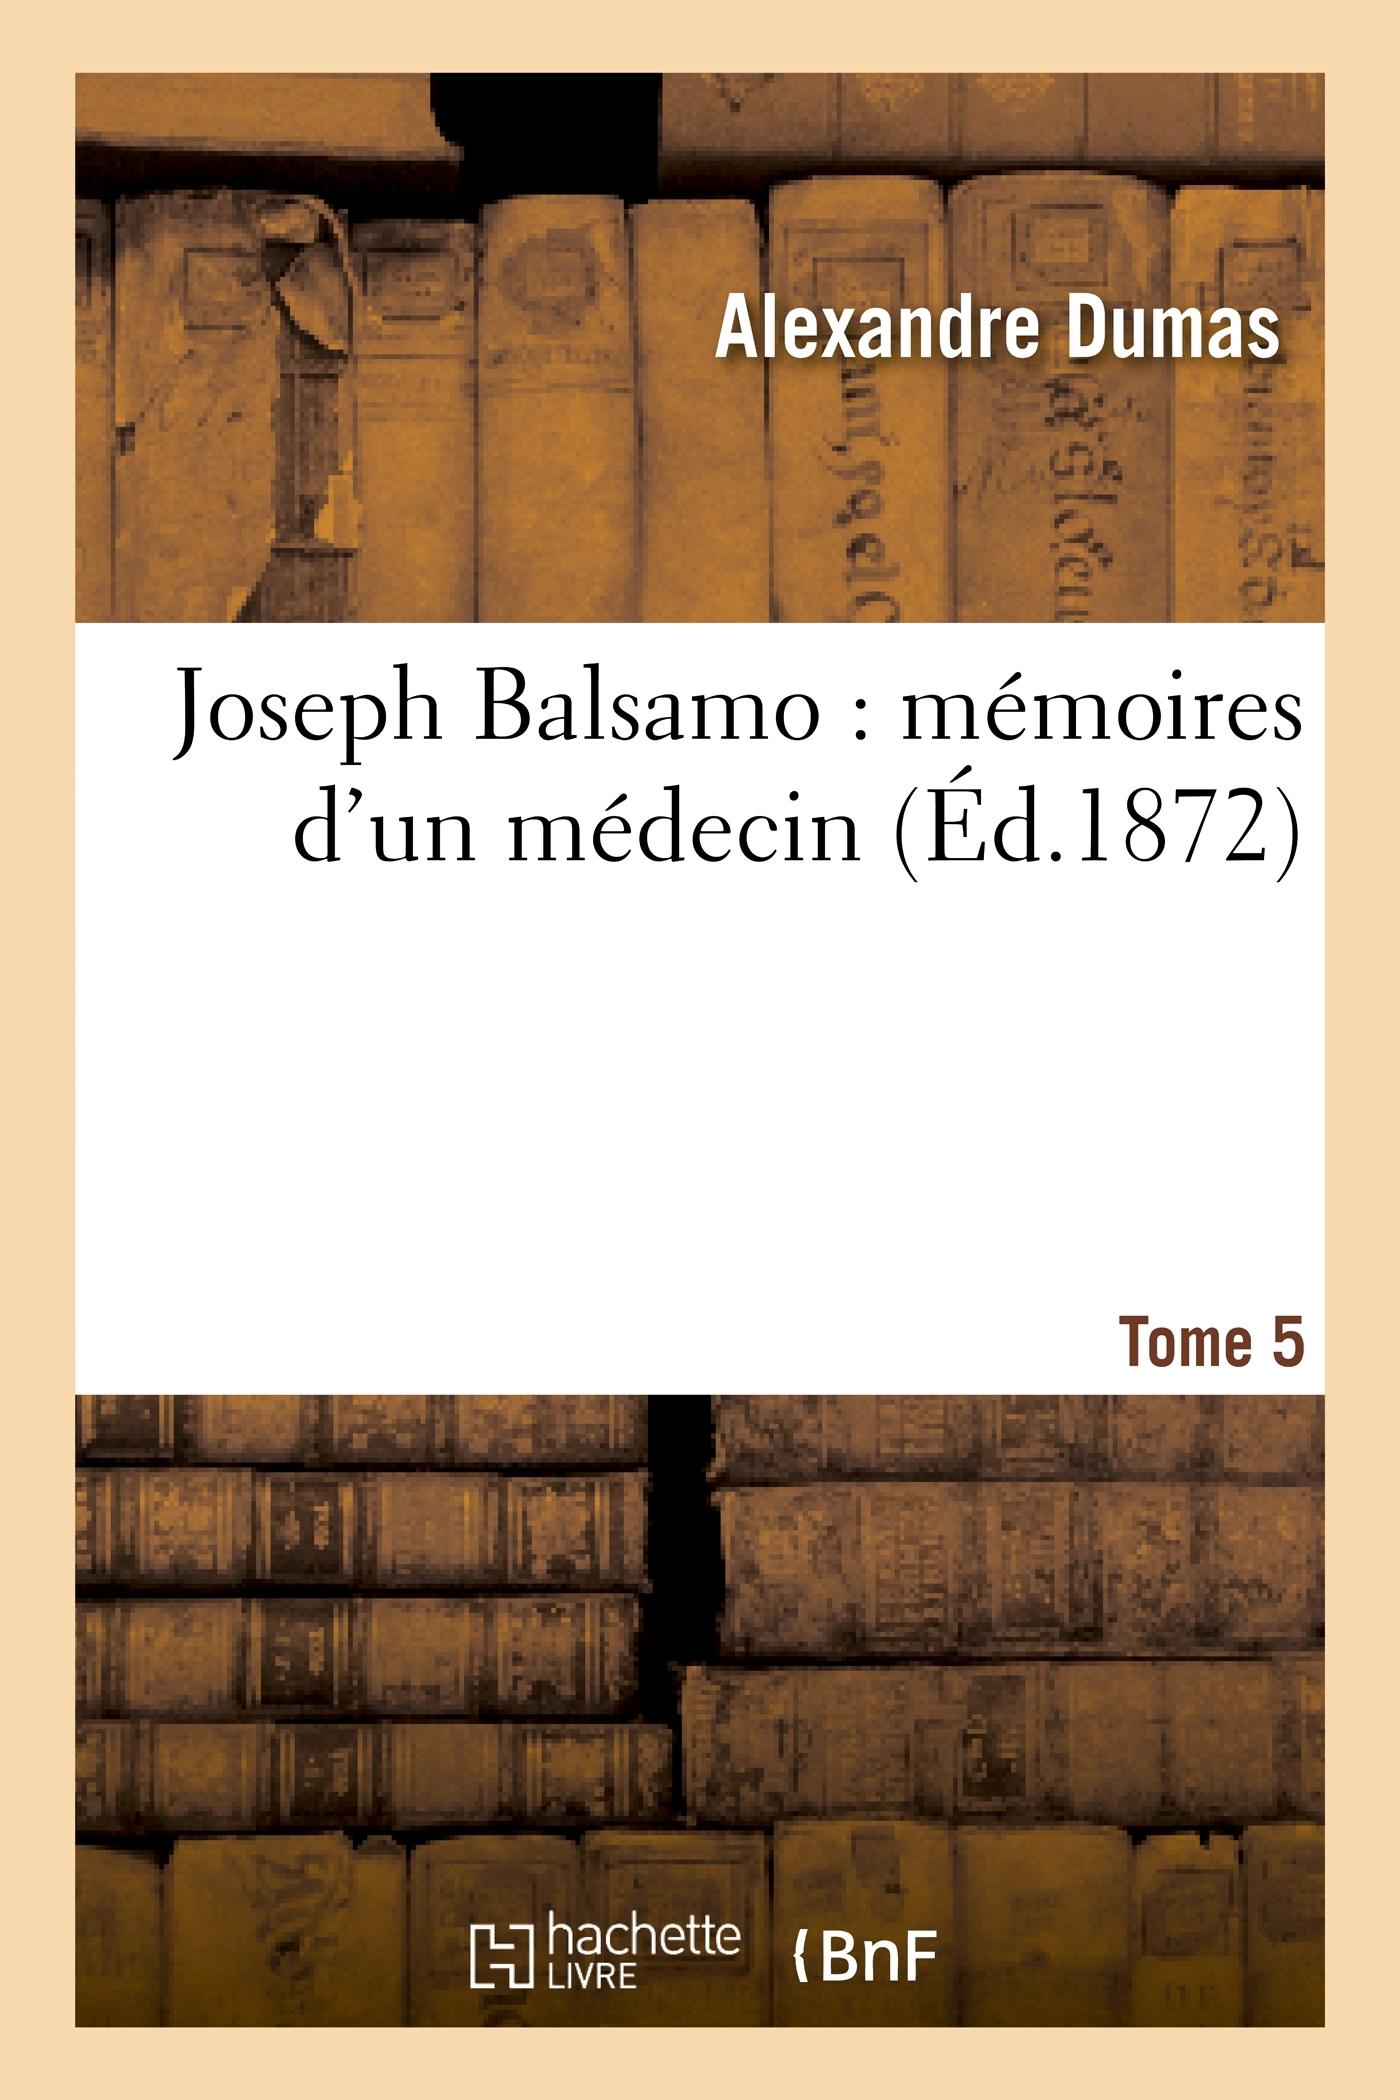 JOSEPH BALSAMO : MEMOIRES D'UN MEDECIN. 5